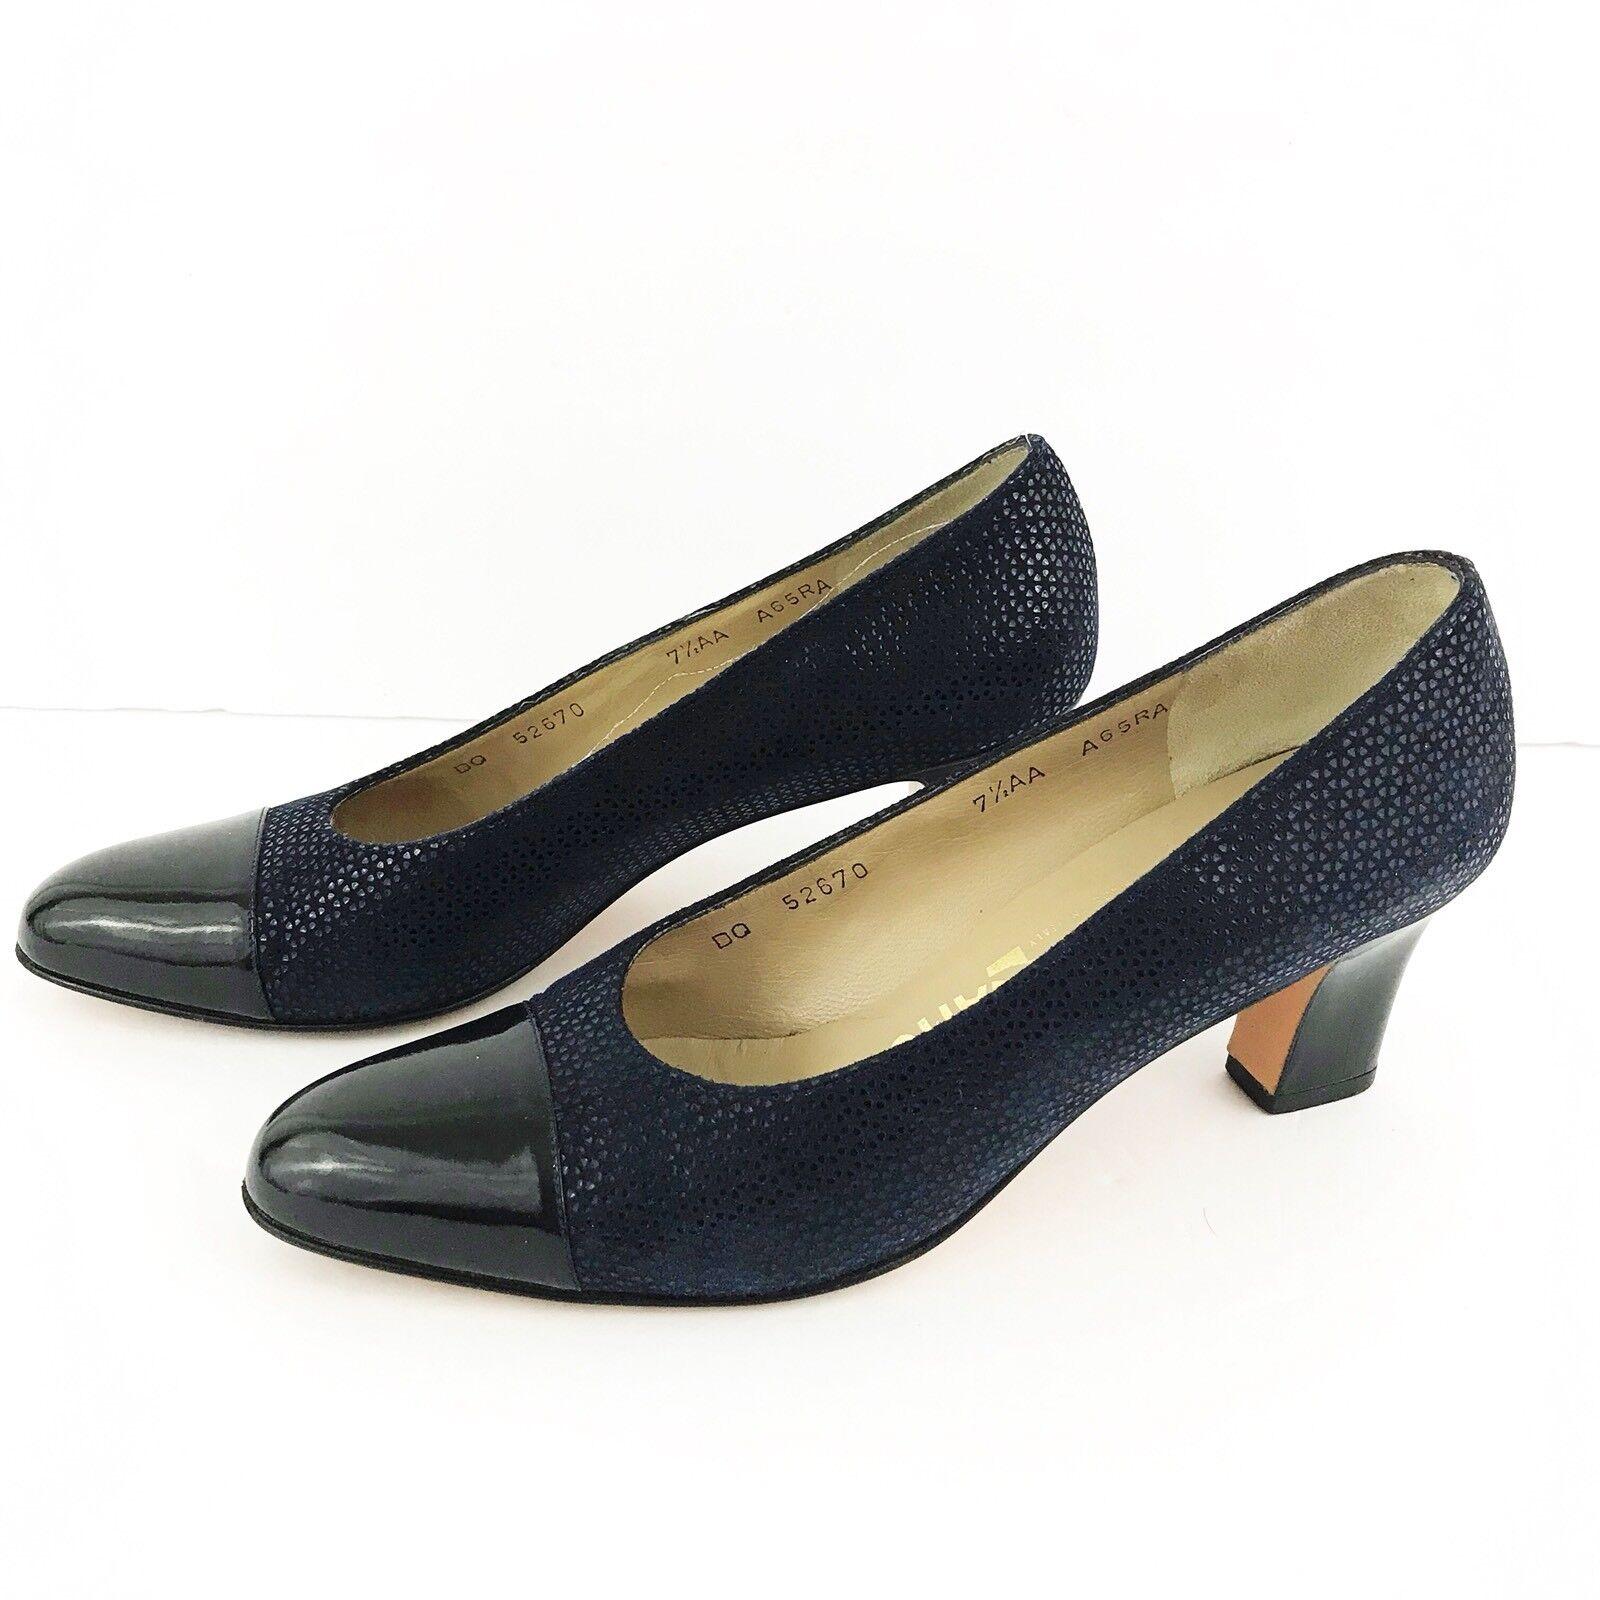 Salvatore Ferragamo bleu or Chaussures Femmes Escarpins Taille 7AA